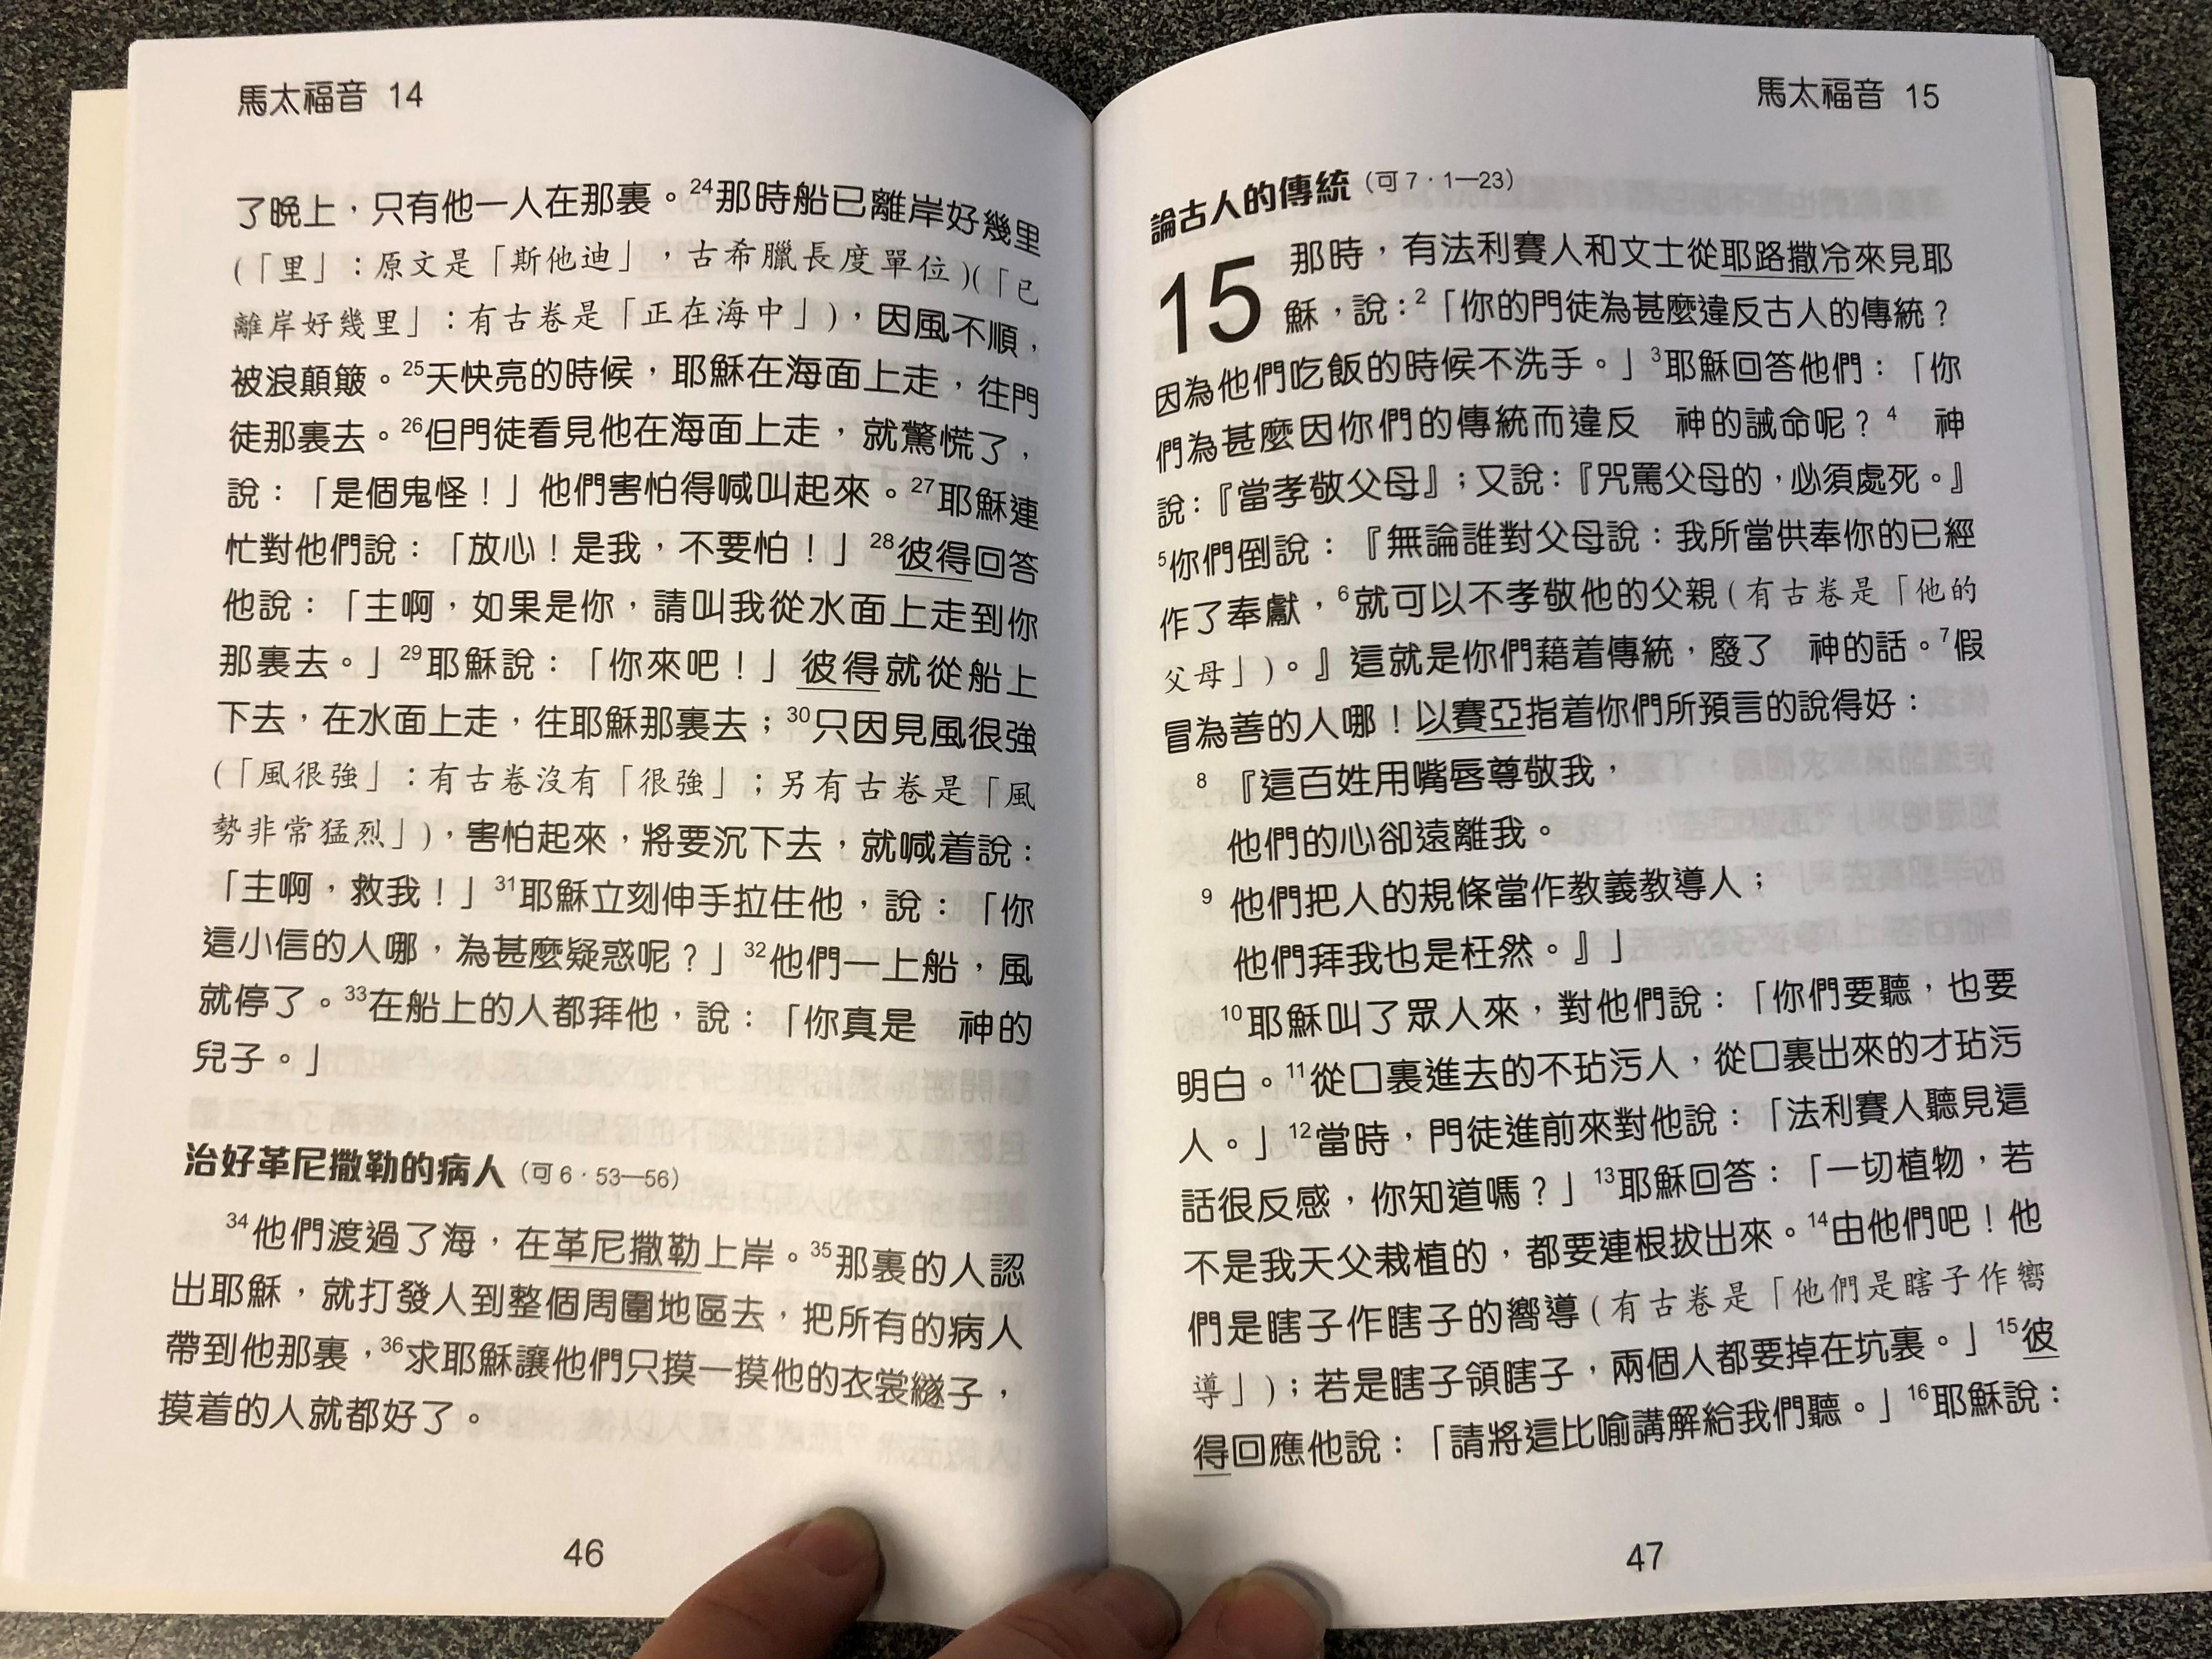 chinese-gospel-of-matthew-with-gospel-bridge-super-large-print-3-.jpg